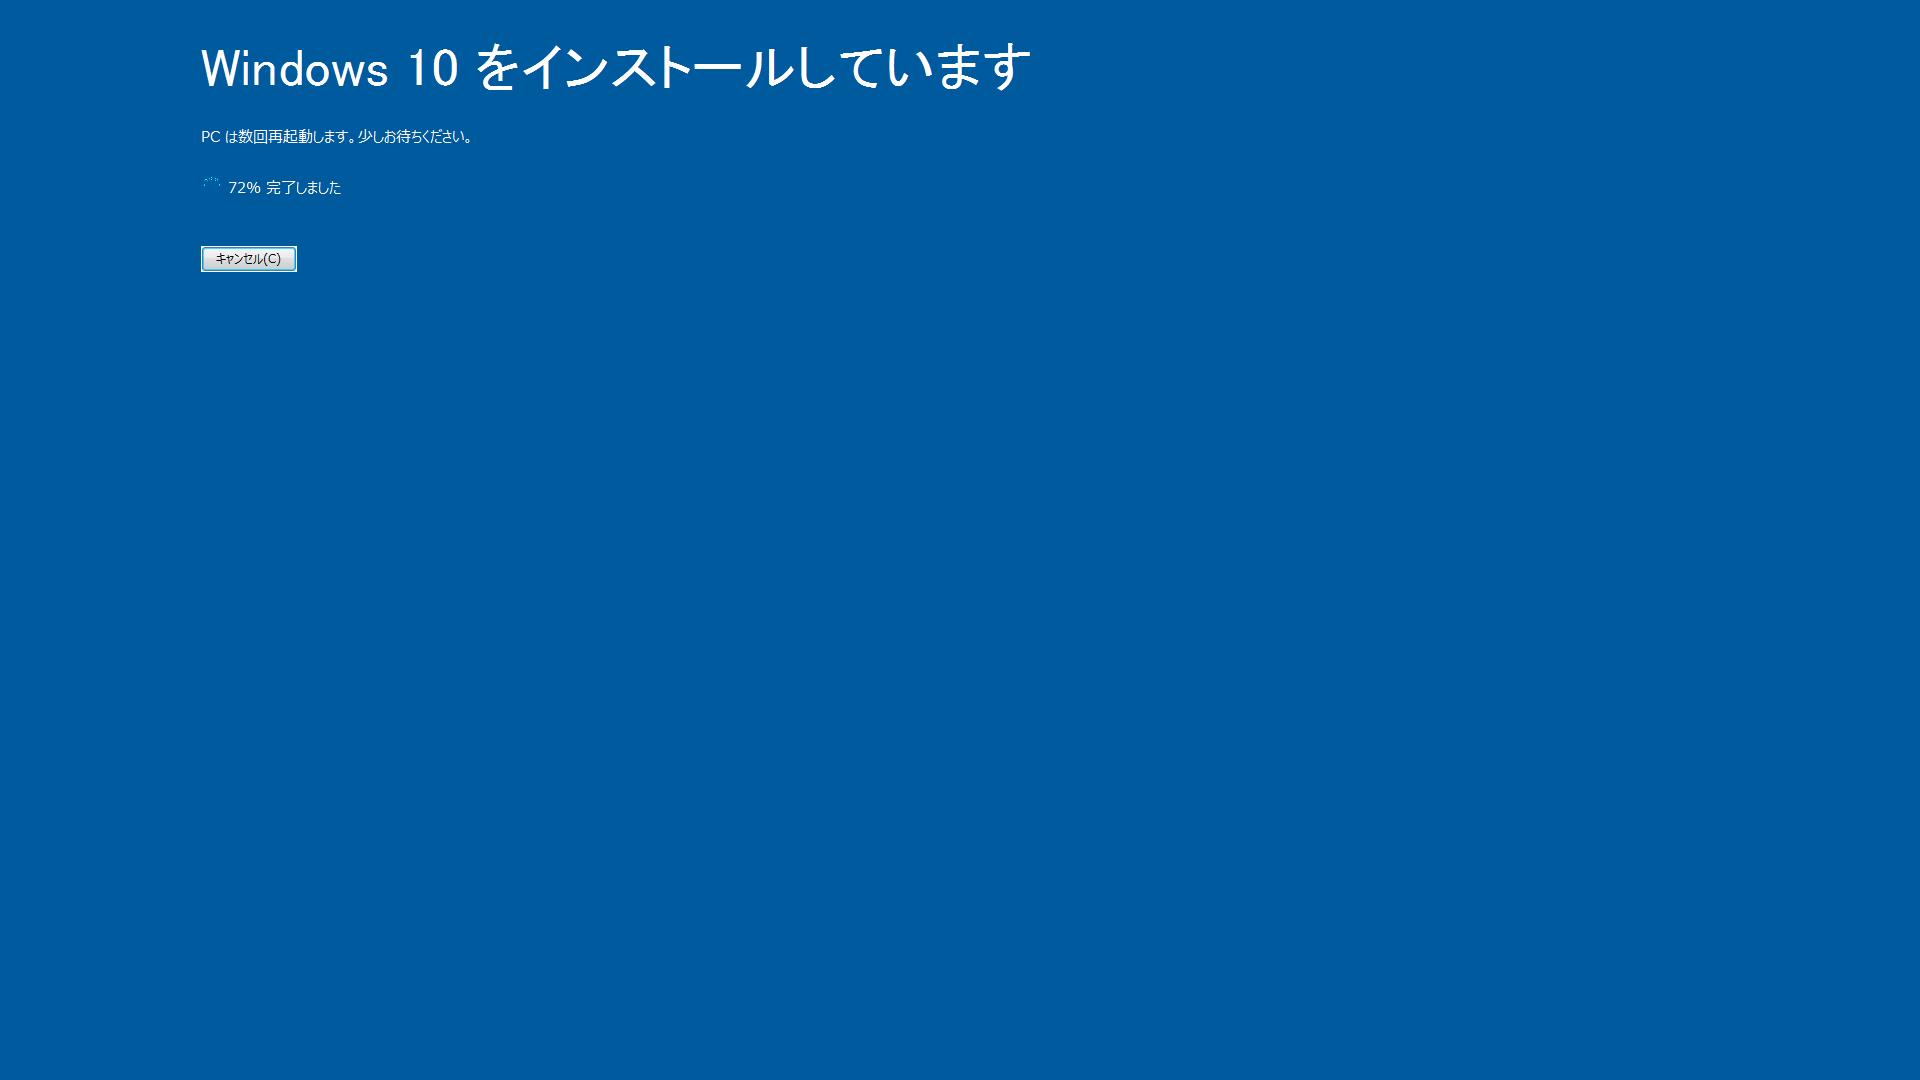 Windows 10 セットアップ_2019-6-5_22-5-52_No-00